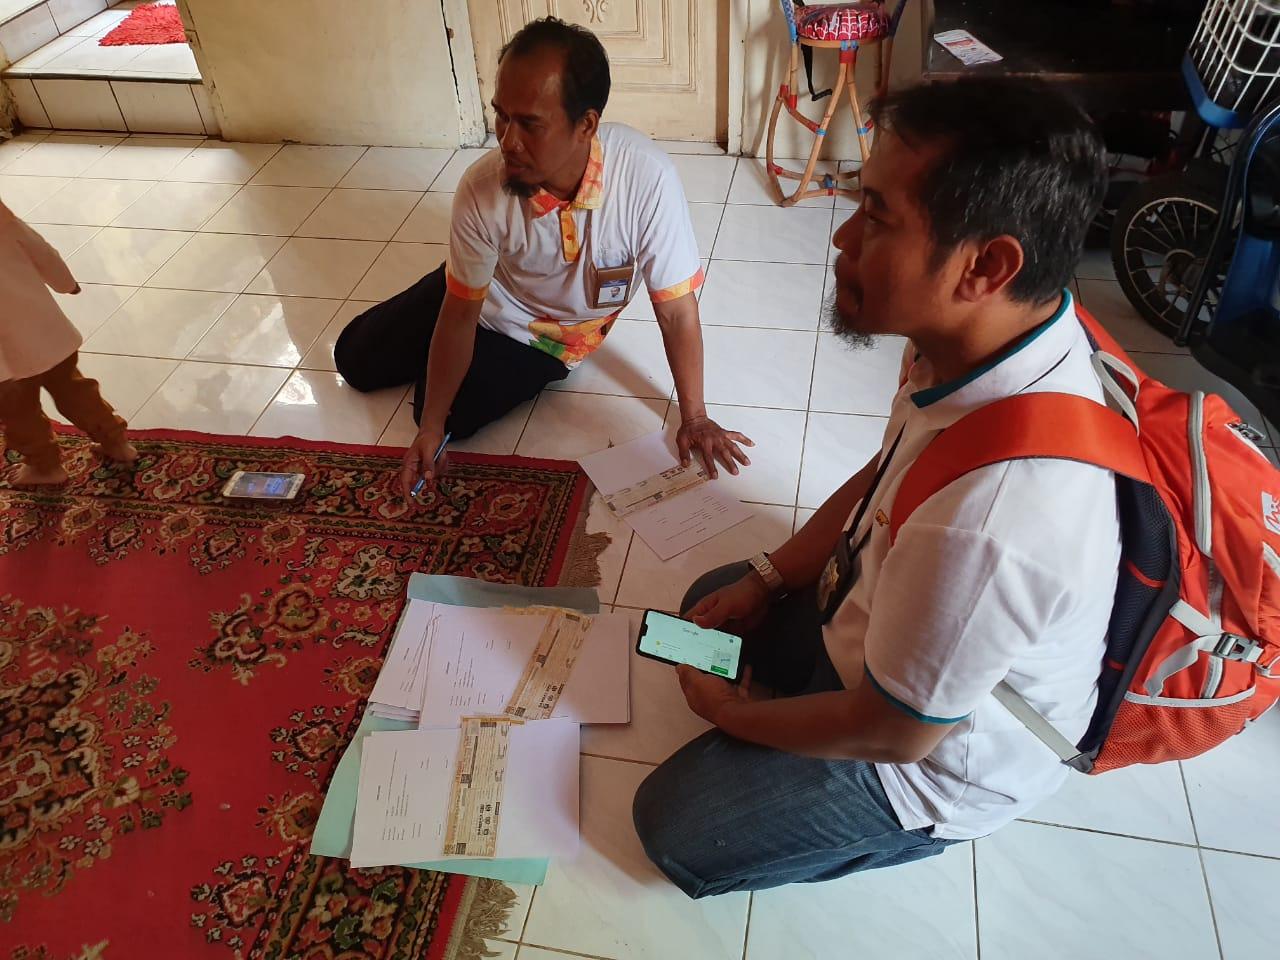 Samsat Online Nasional, Petugas Samsat Anterin STNK Pajak Kendaraan